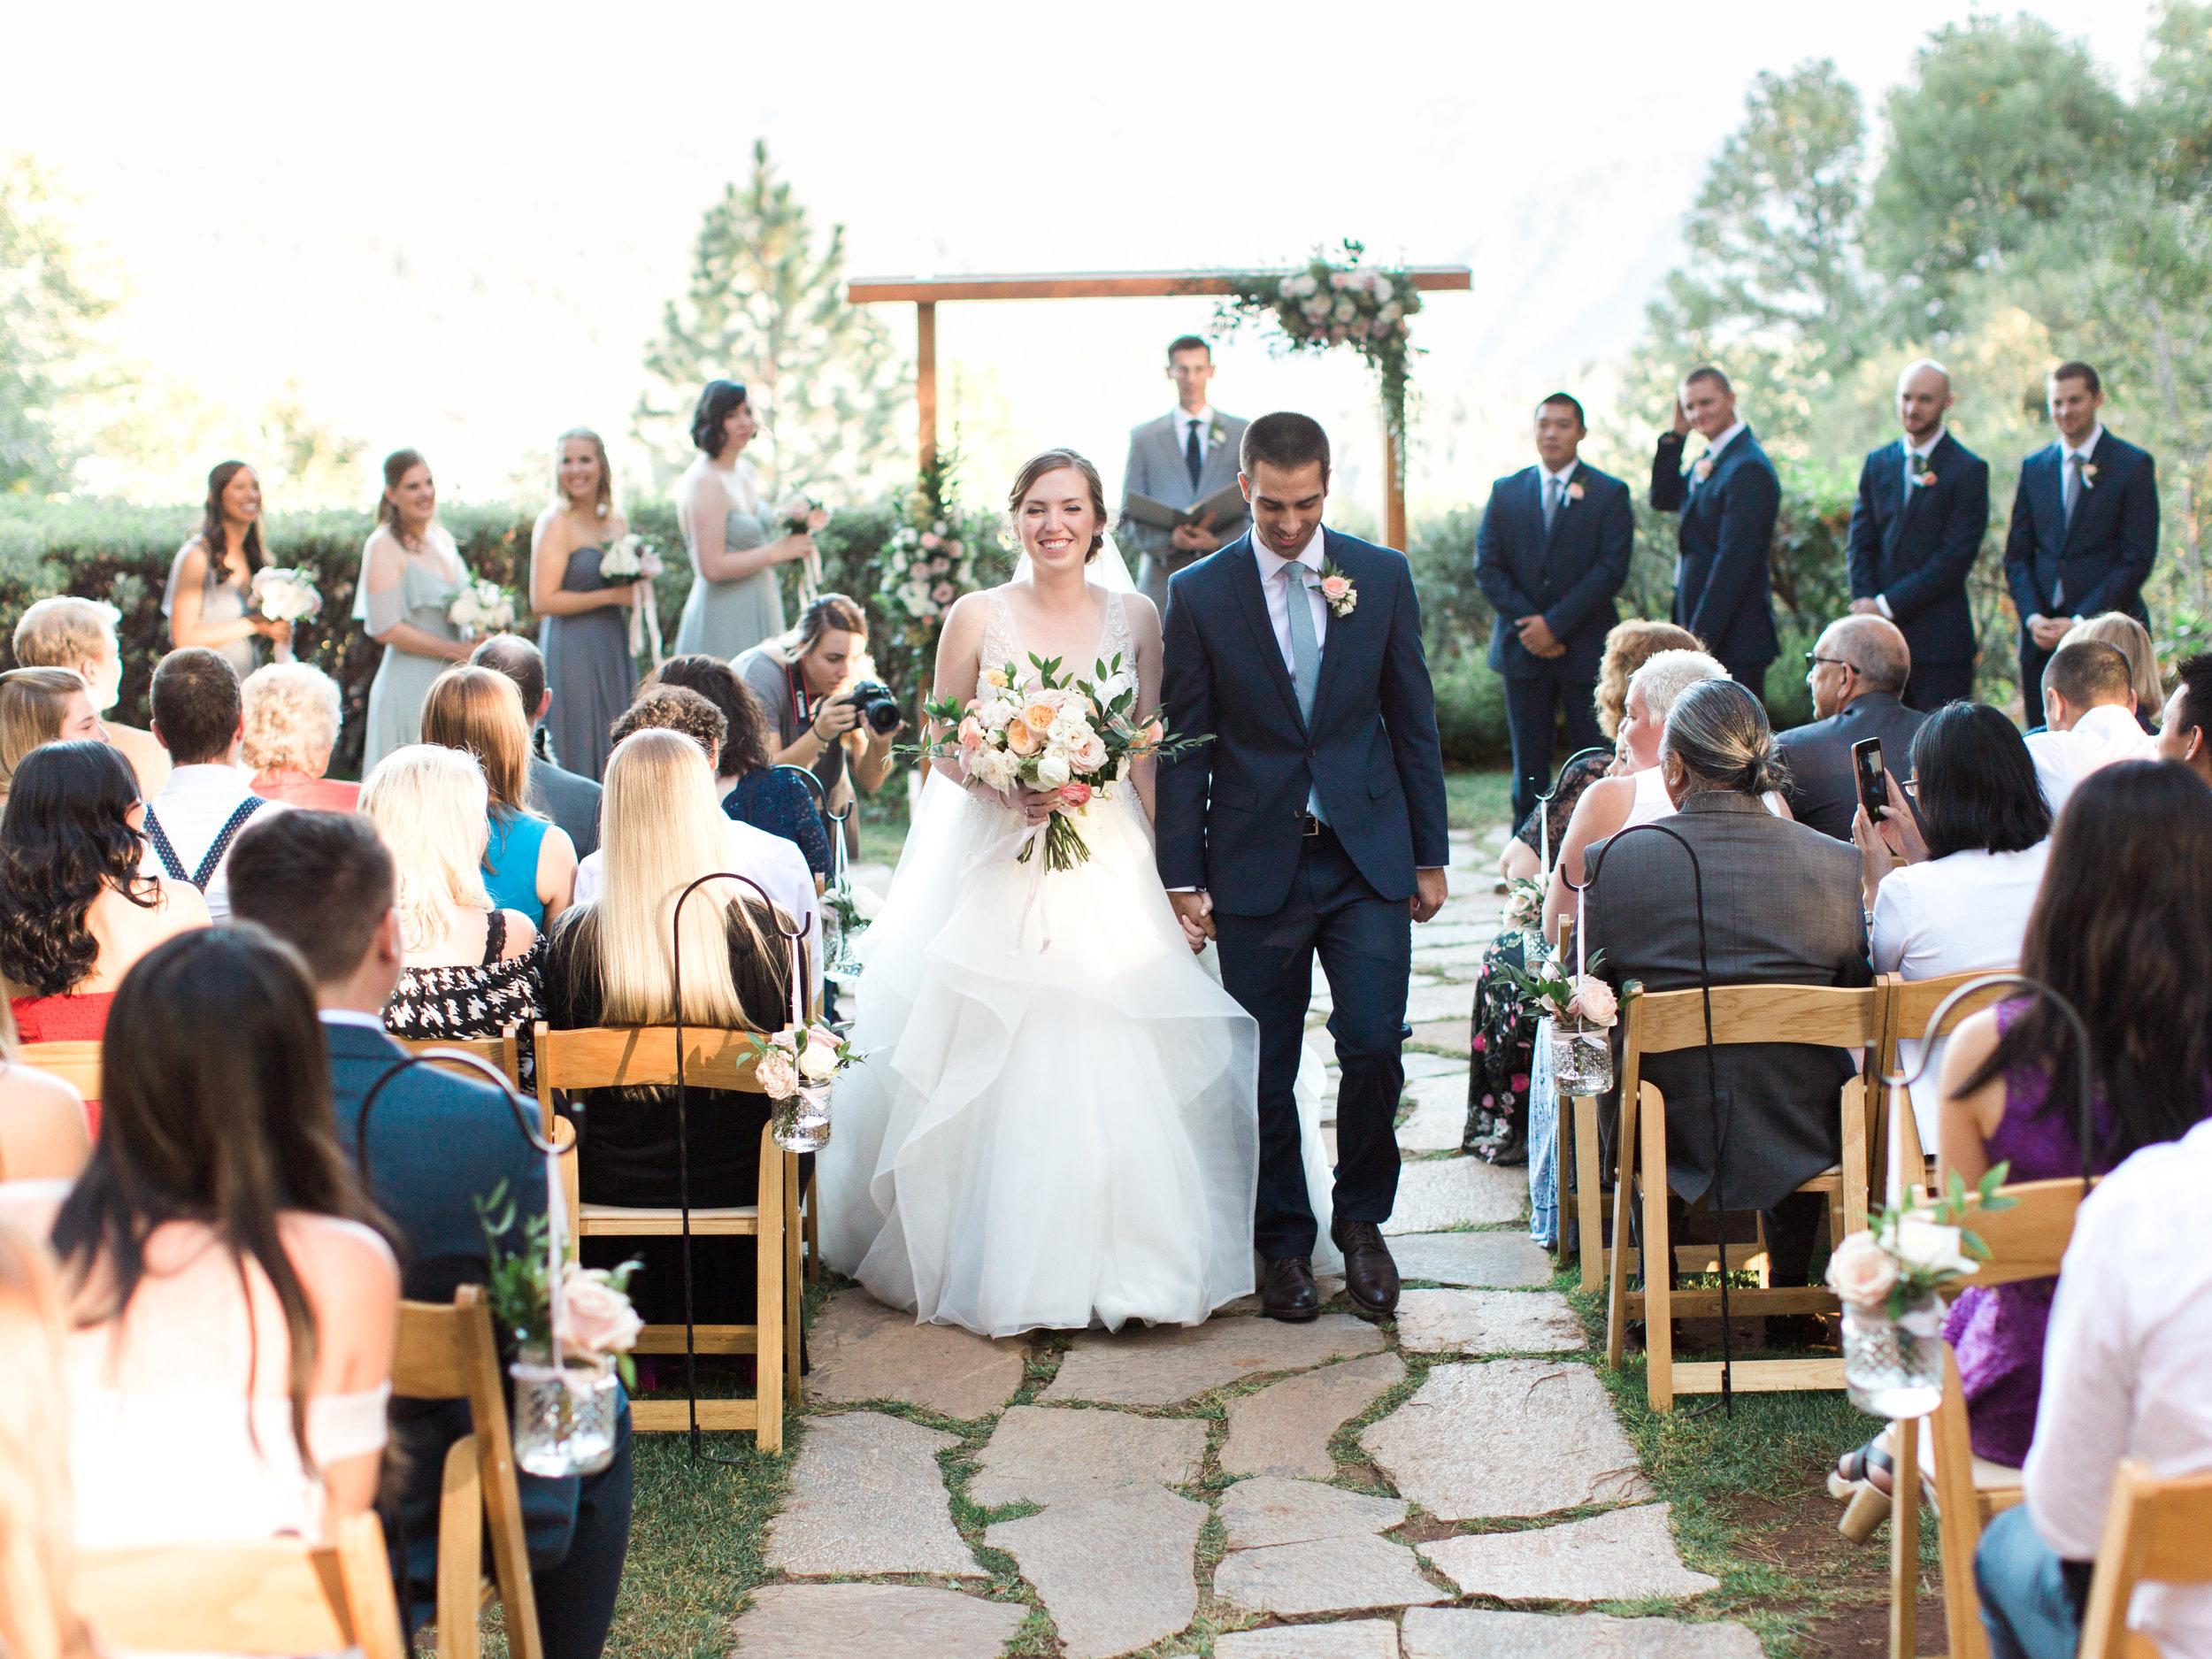 foresthill-lodge-wedding-1-4.jpg